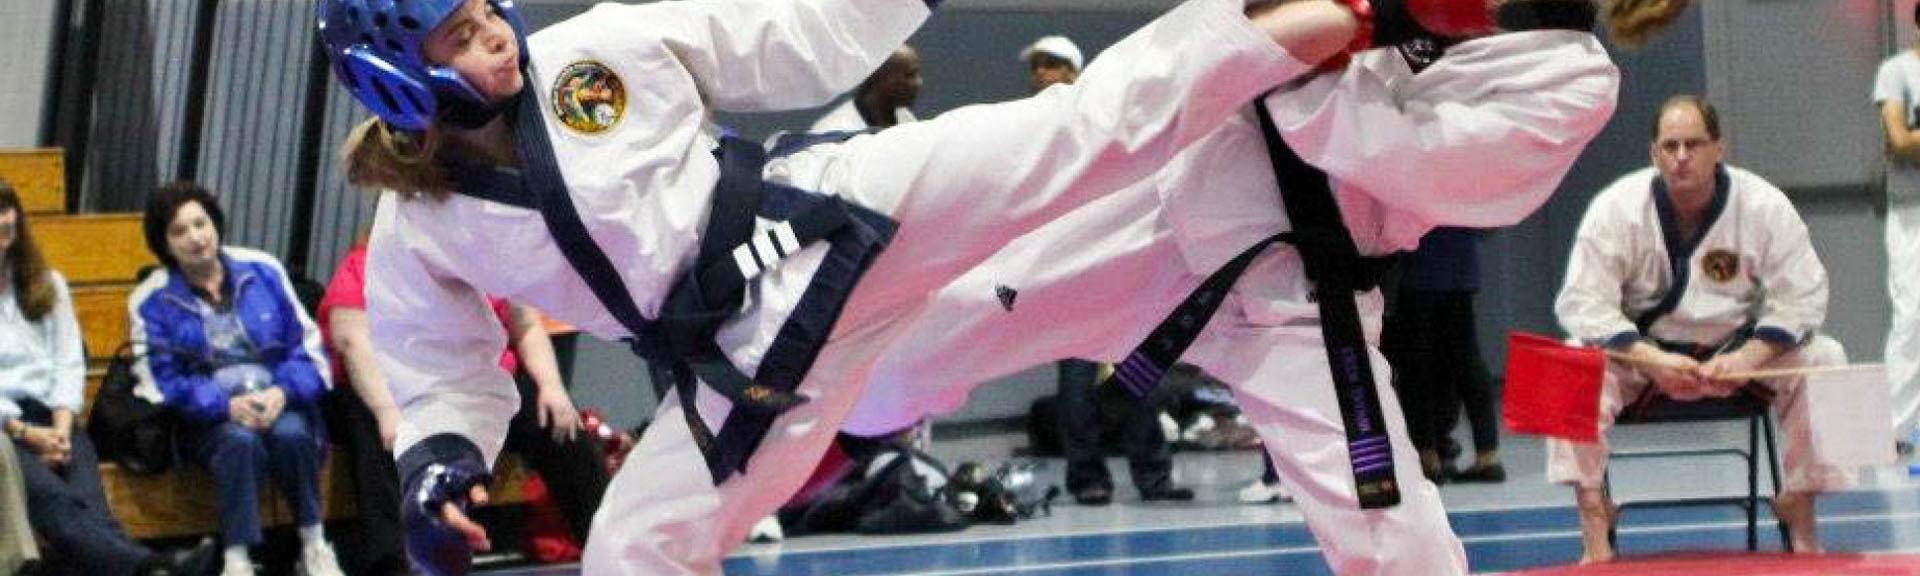 karate in port elgin